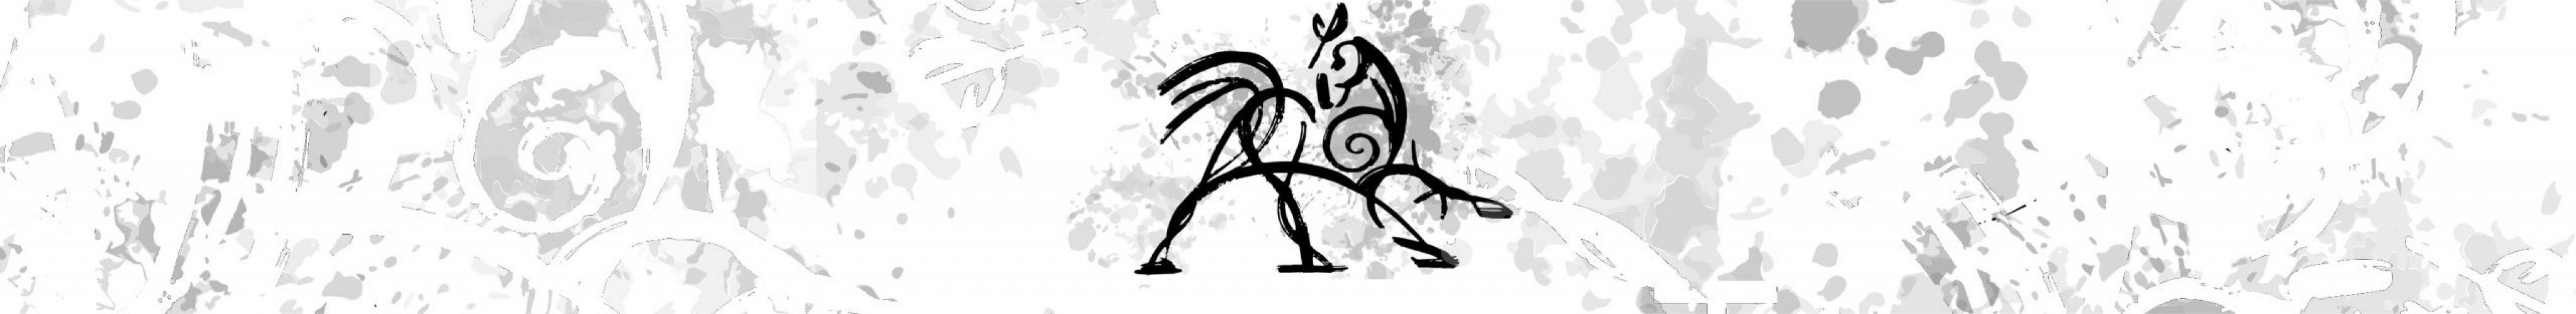 Hooded Horse Blog Banner Square